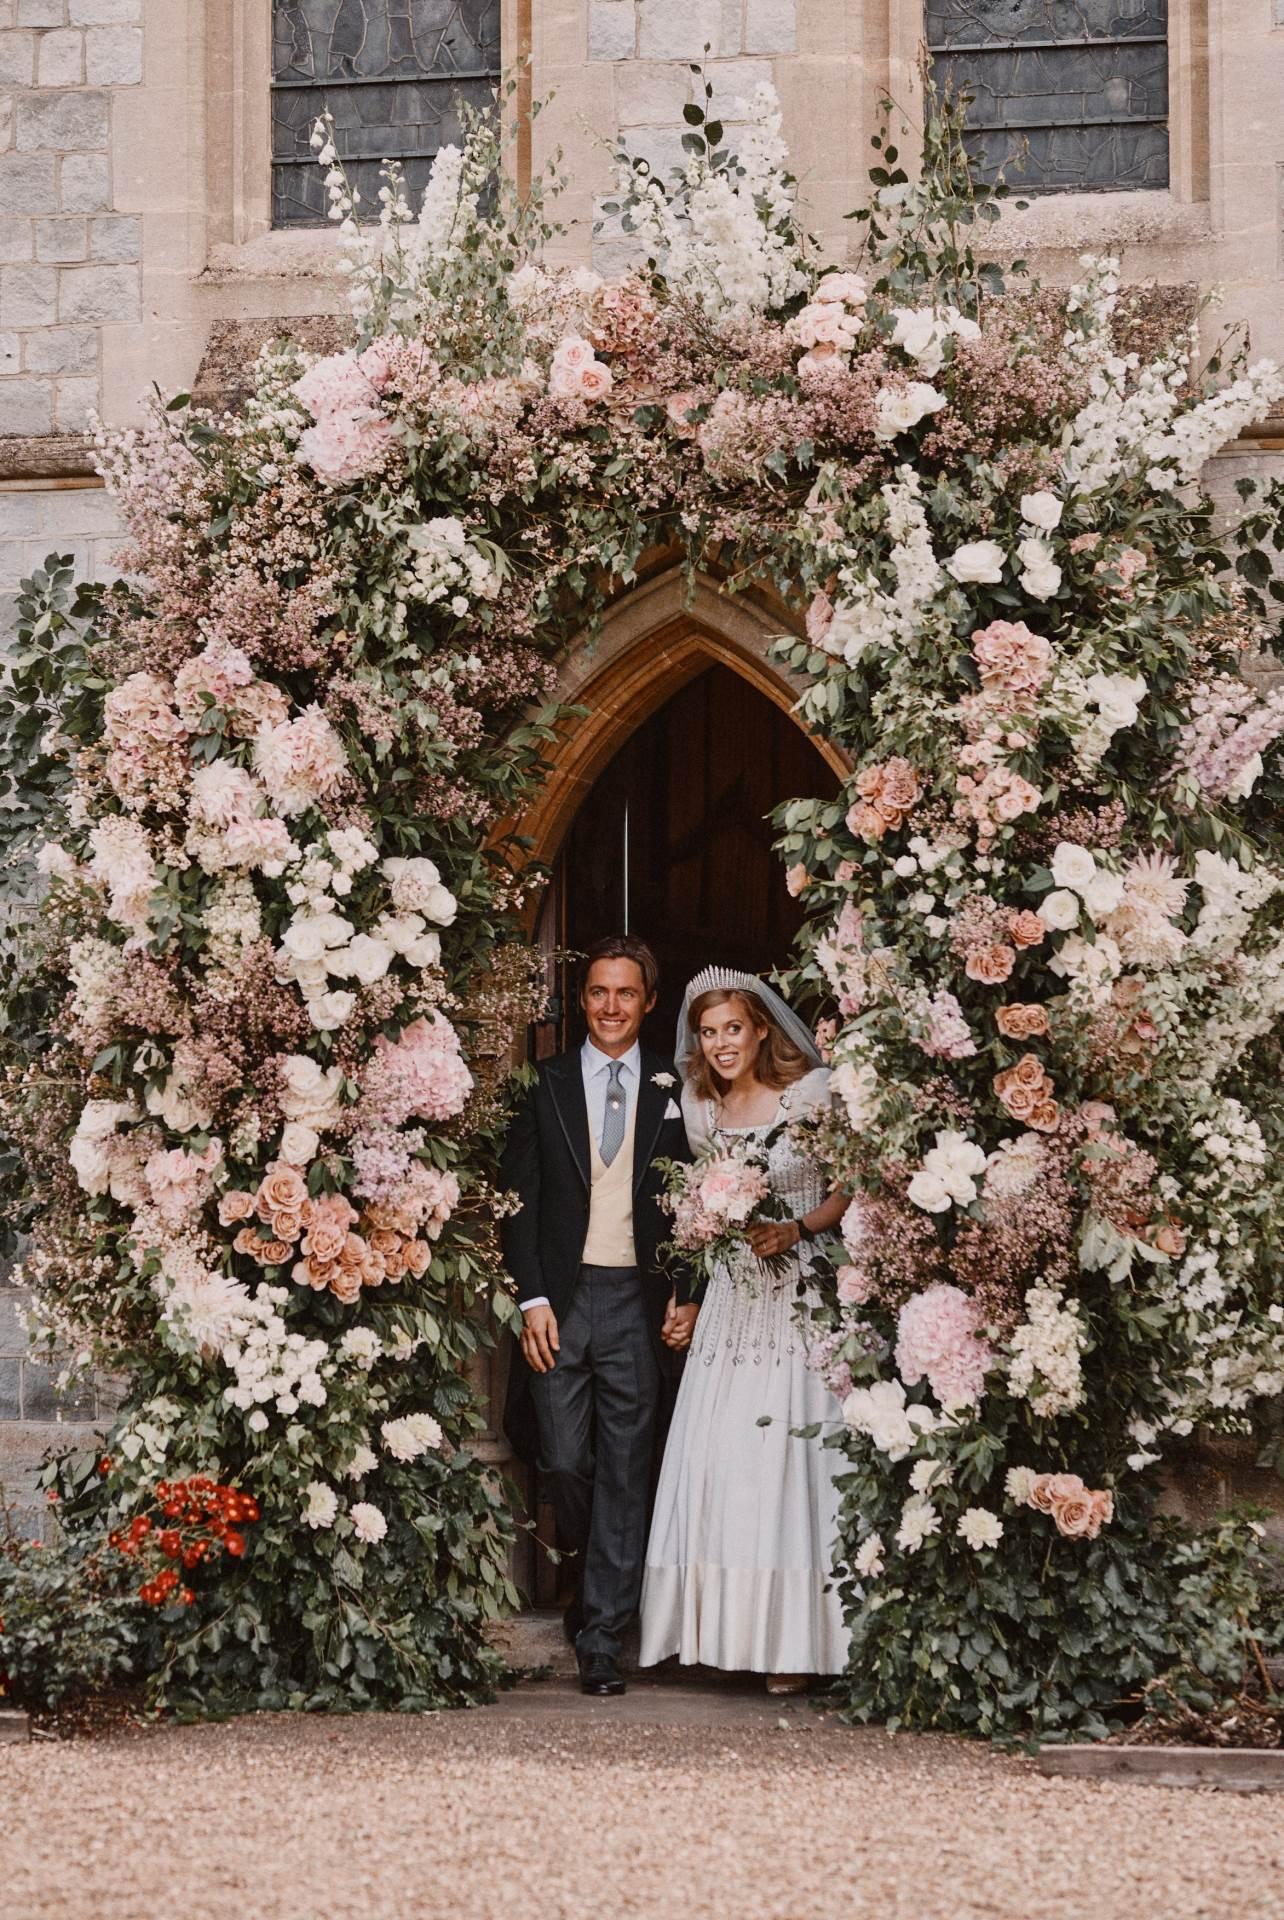 Princeza Beatrice i Edoardo Mapelli Mozzi na vjenčanju koncem prošle godine